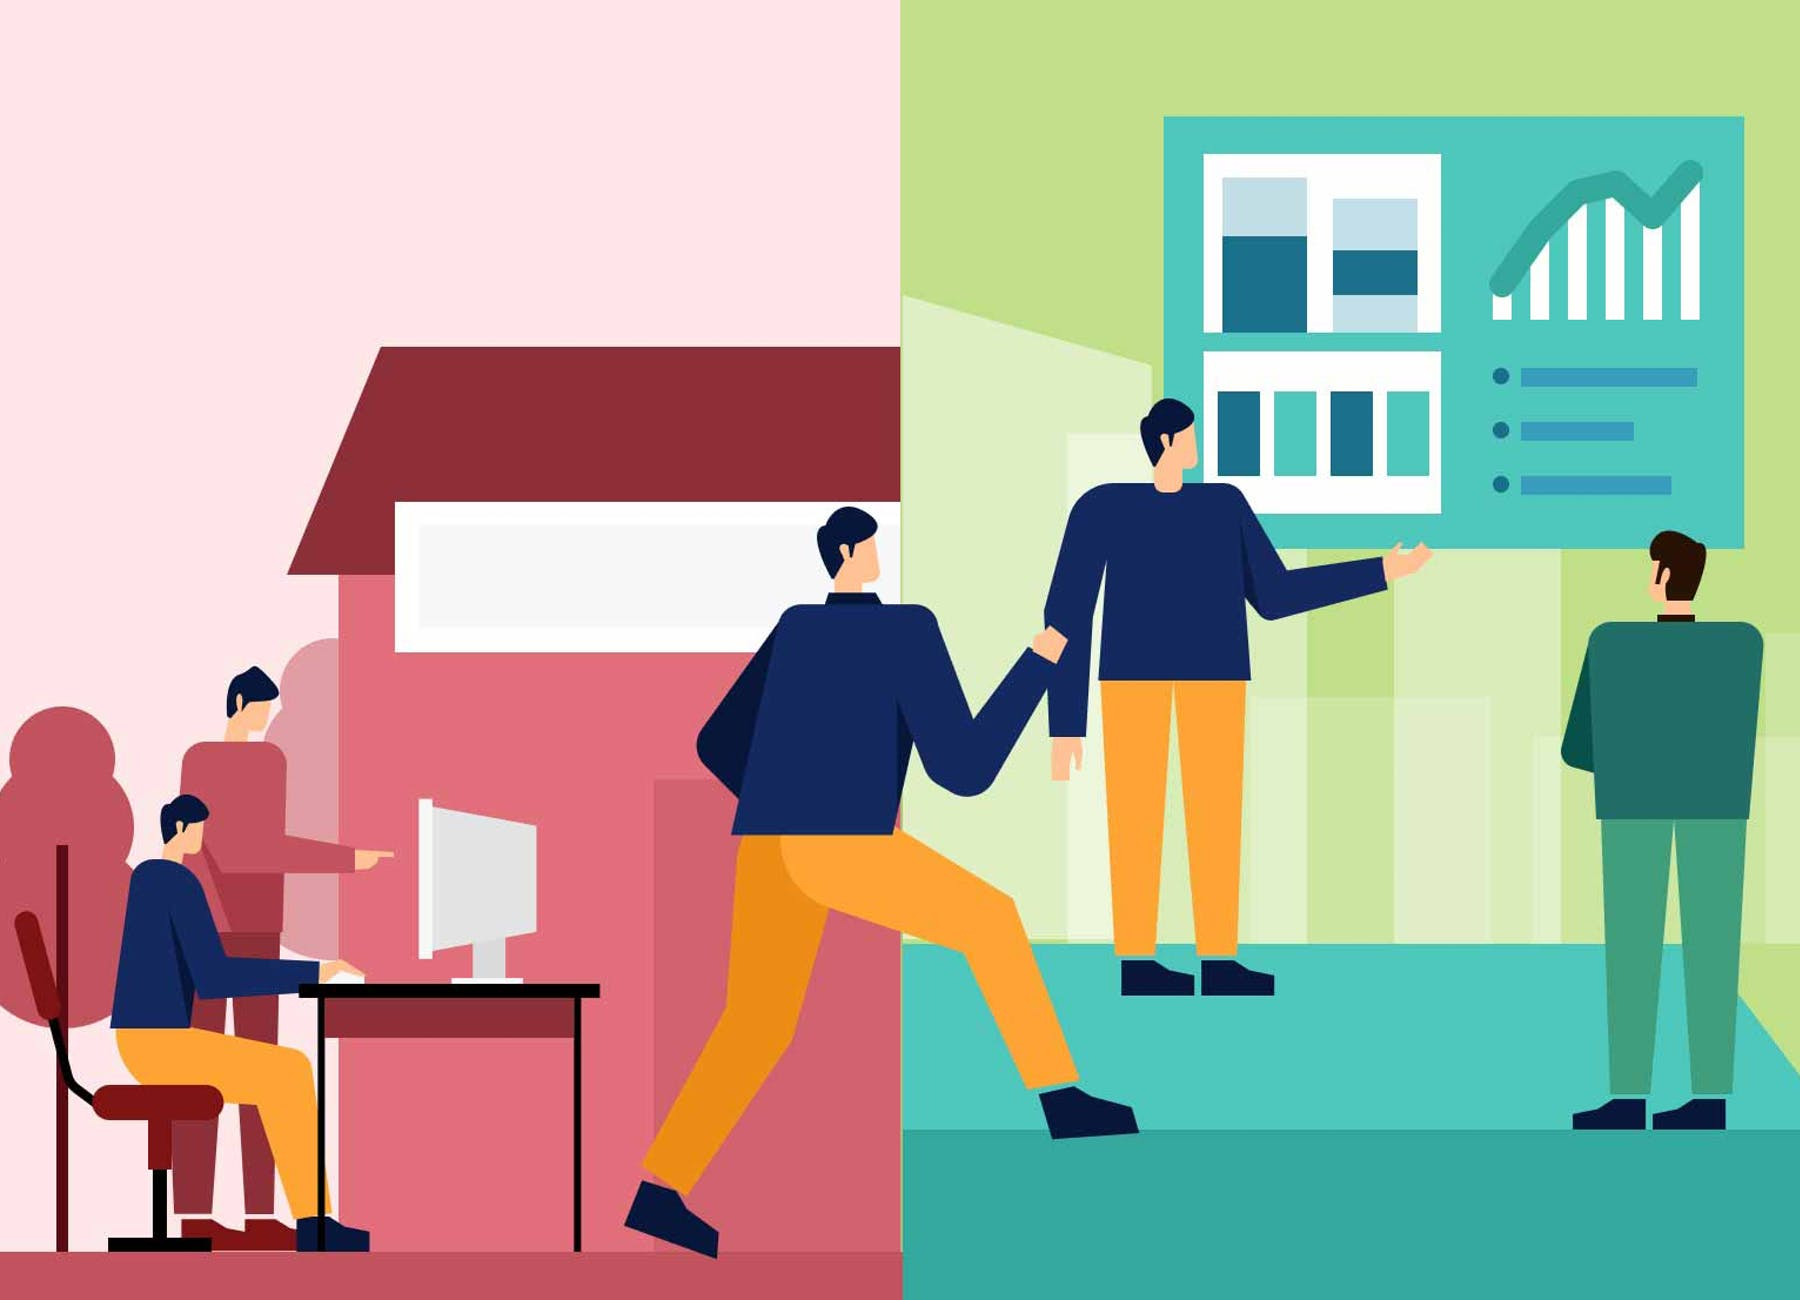 Utilising brand synergy to grow as a creative agency